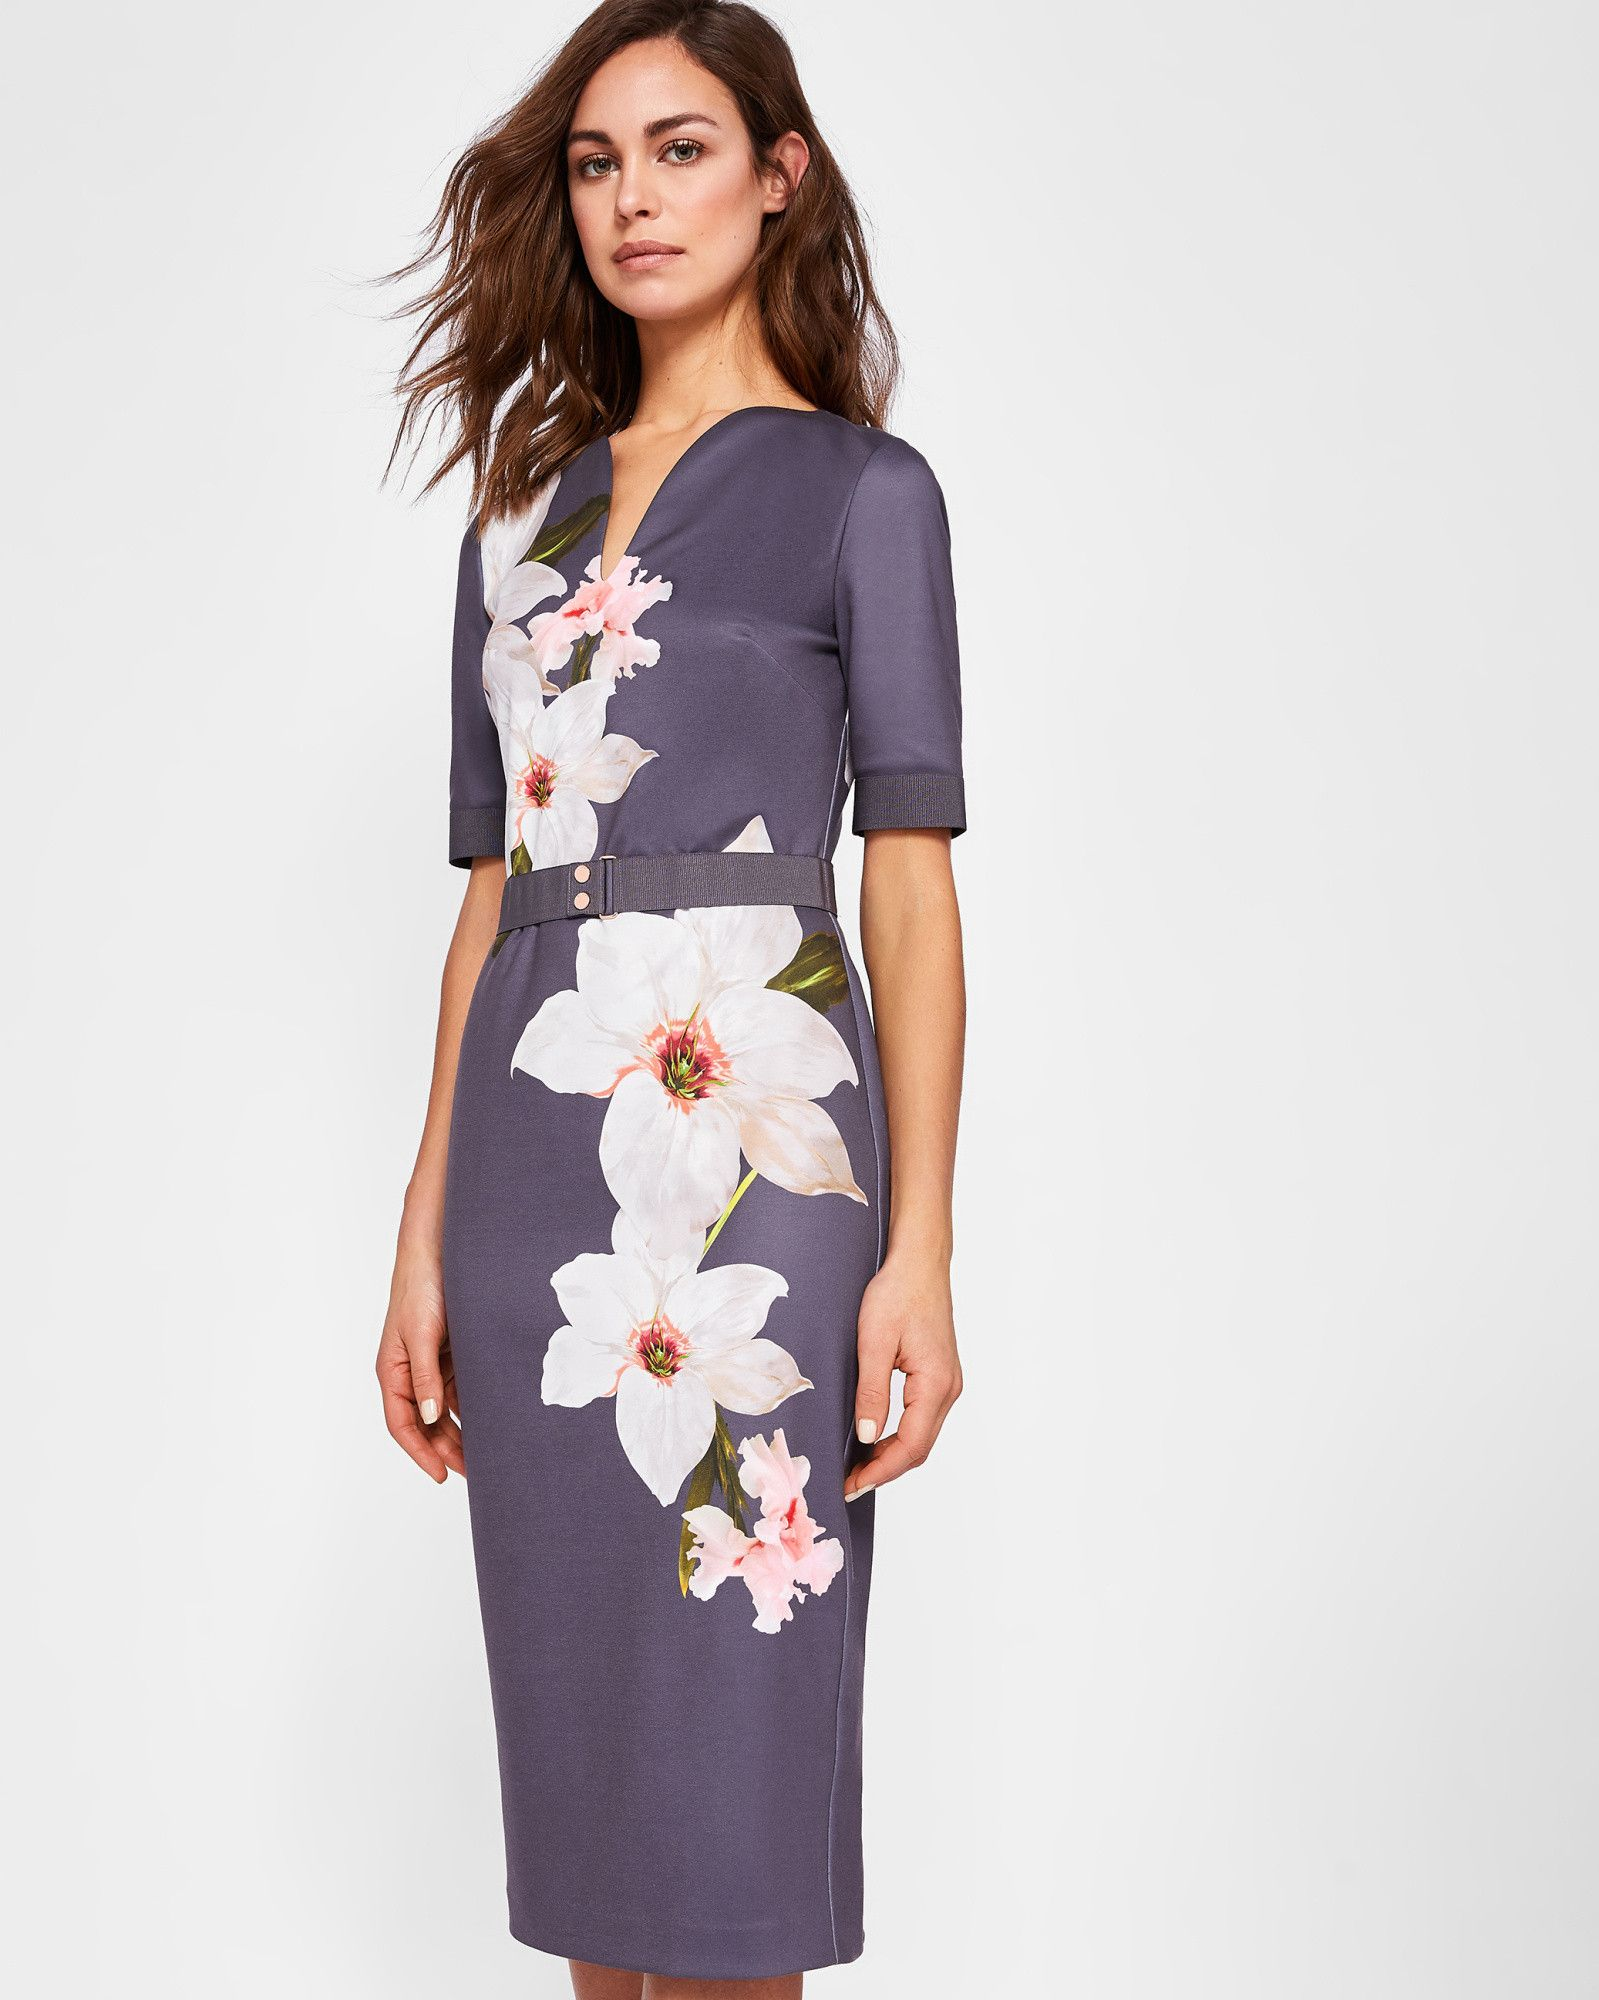 d330defe BISSLEE Chatsworth bodycon dress #TedToToe   Parlez vous Fashion ...